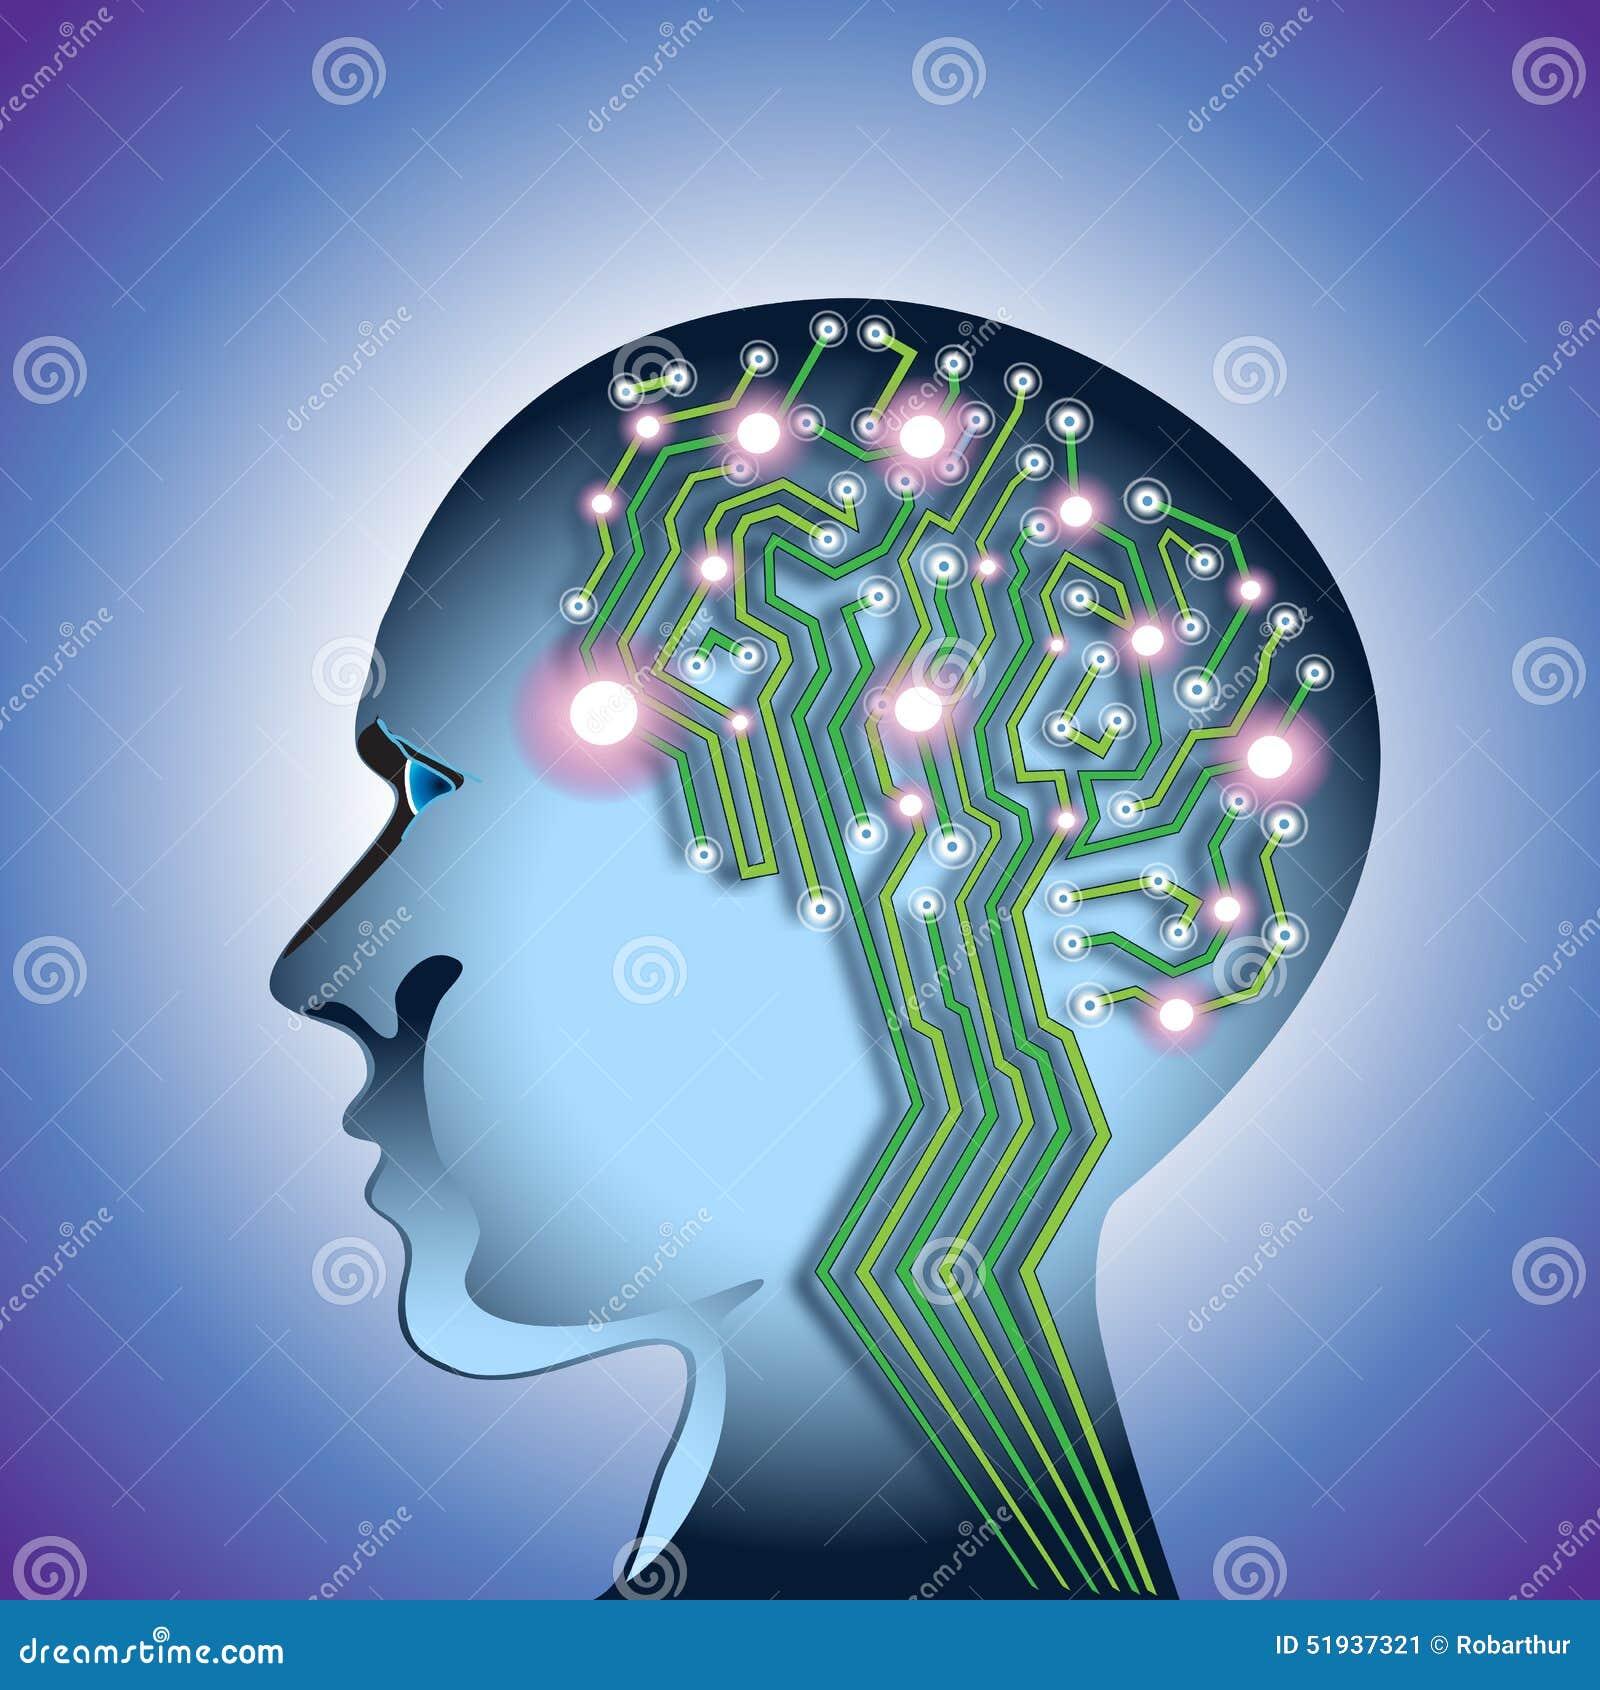 Circuit Brain Reusable : Abstract brain circuit stock vector image